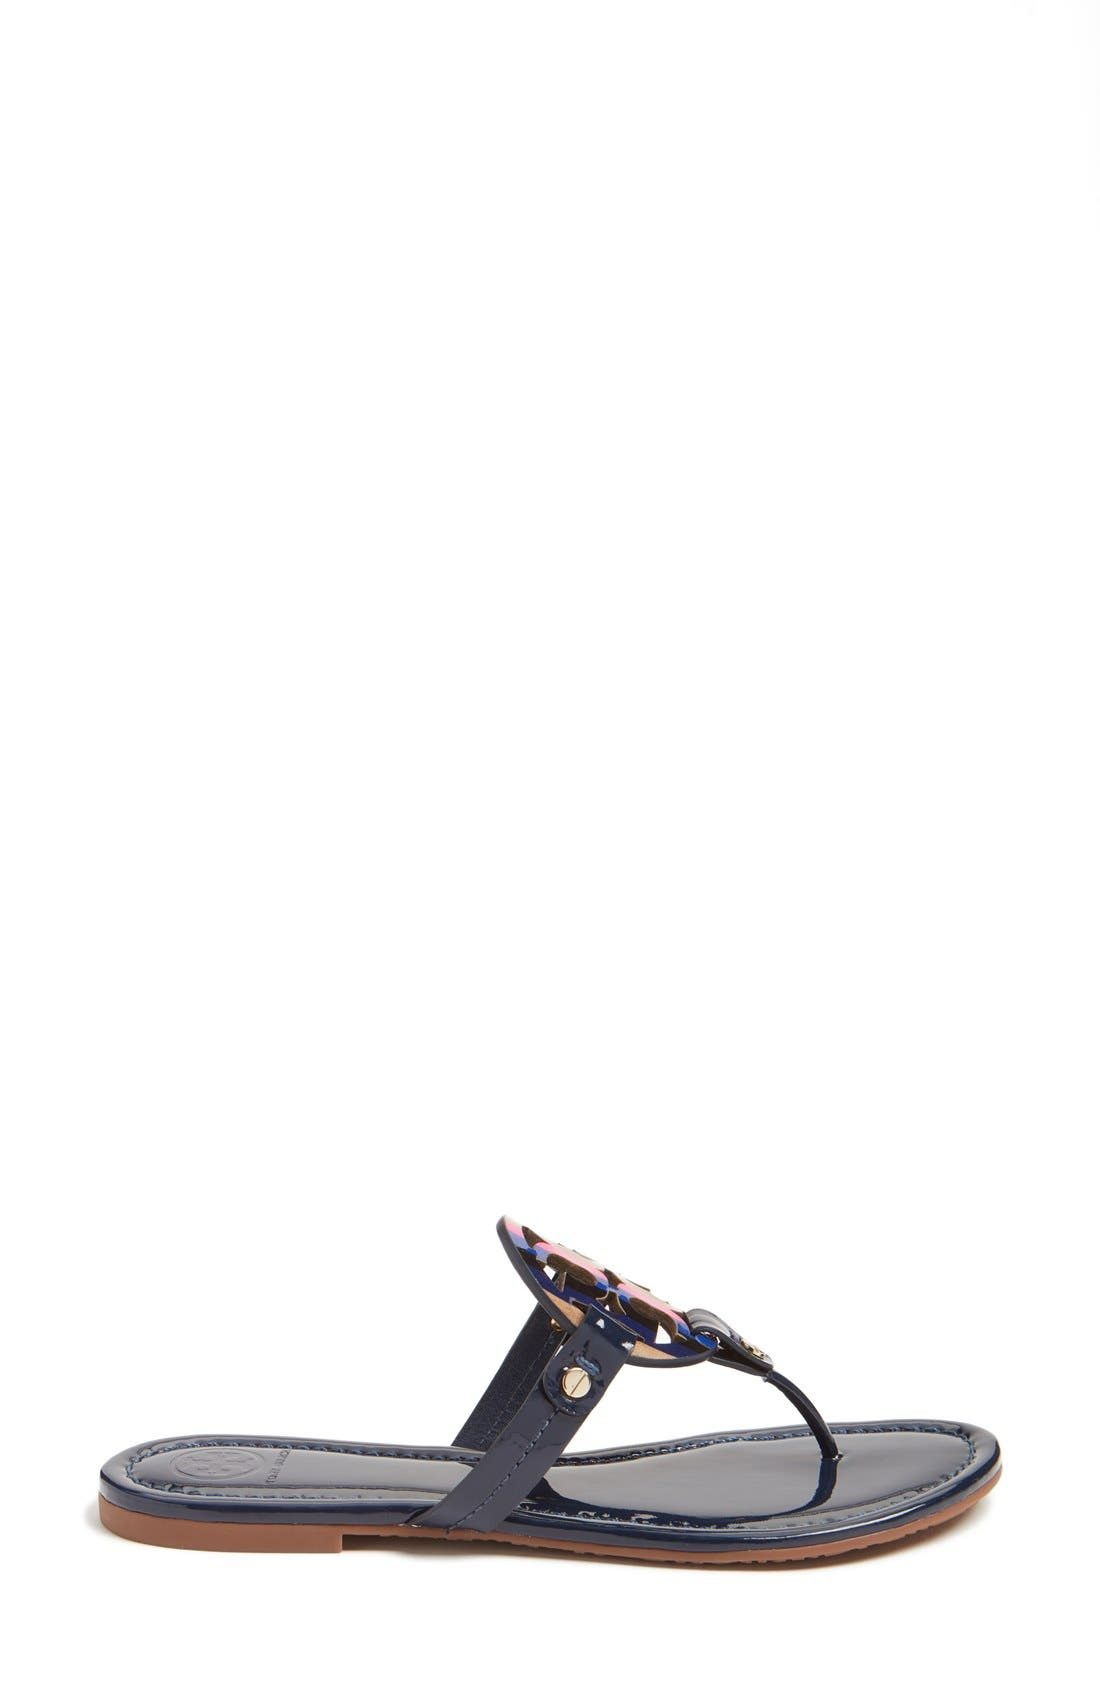 'Miller' Flip Flop,                             Alternate thumbnail 205, color,